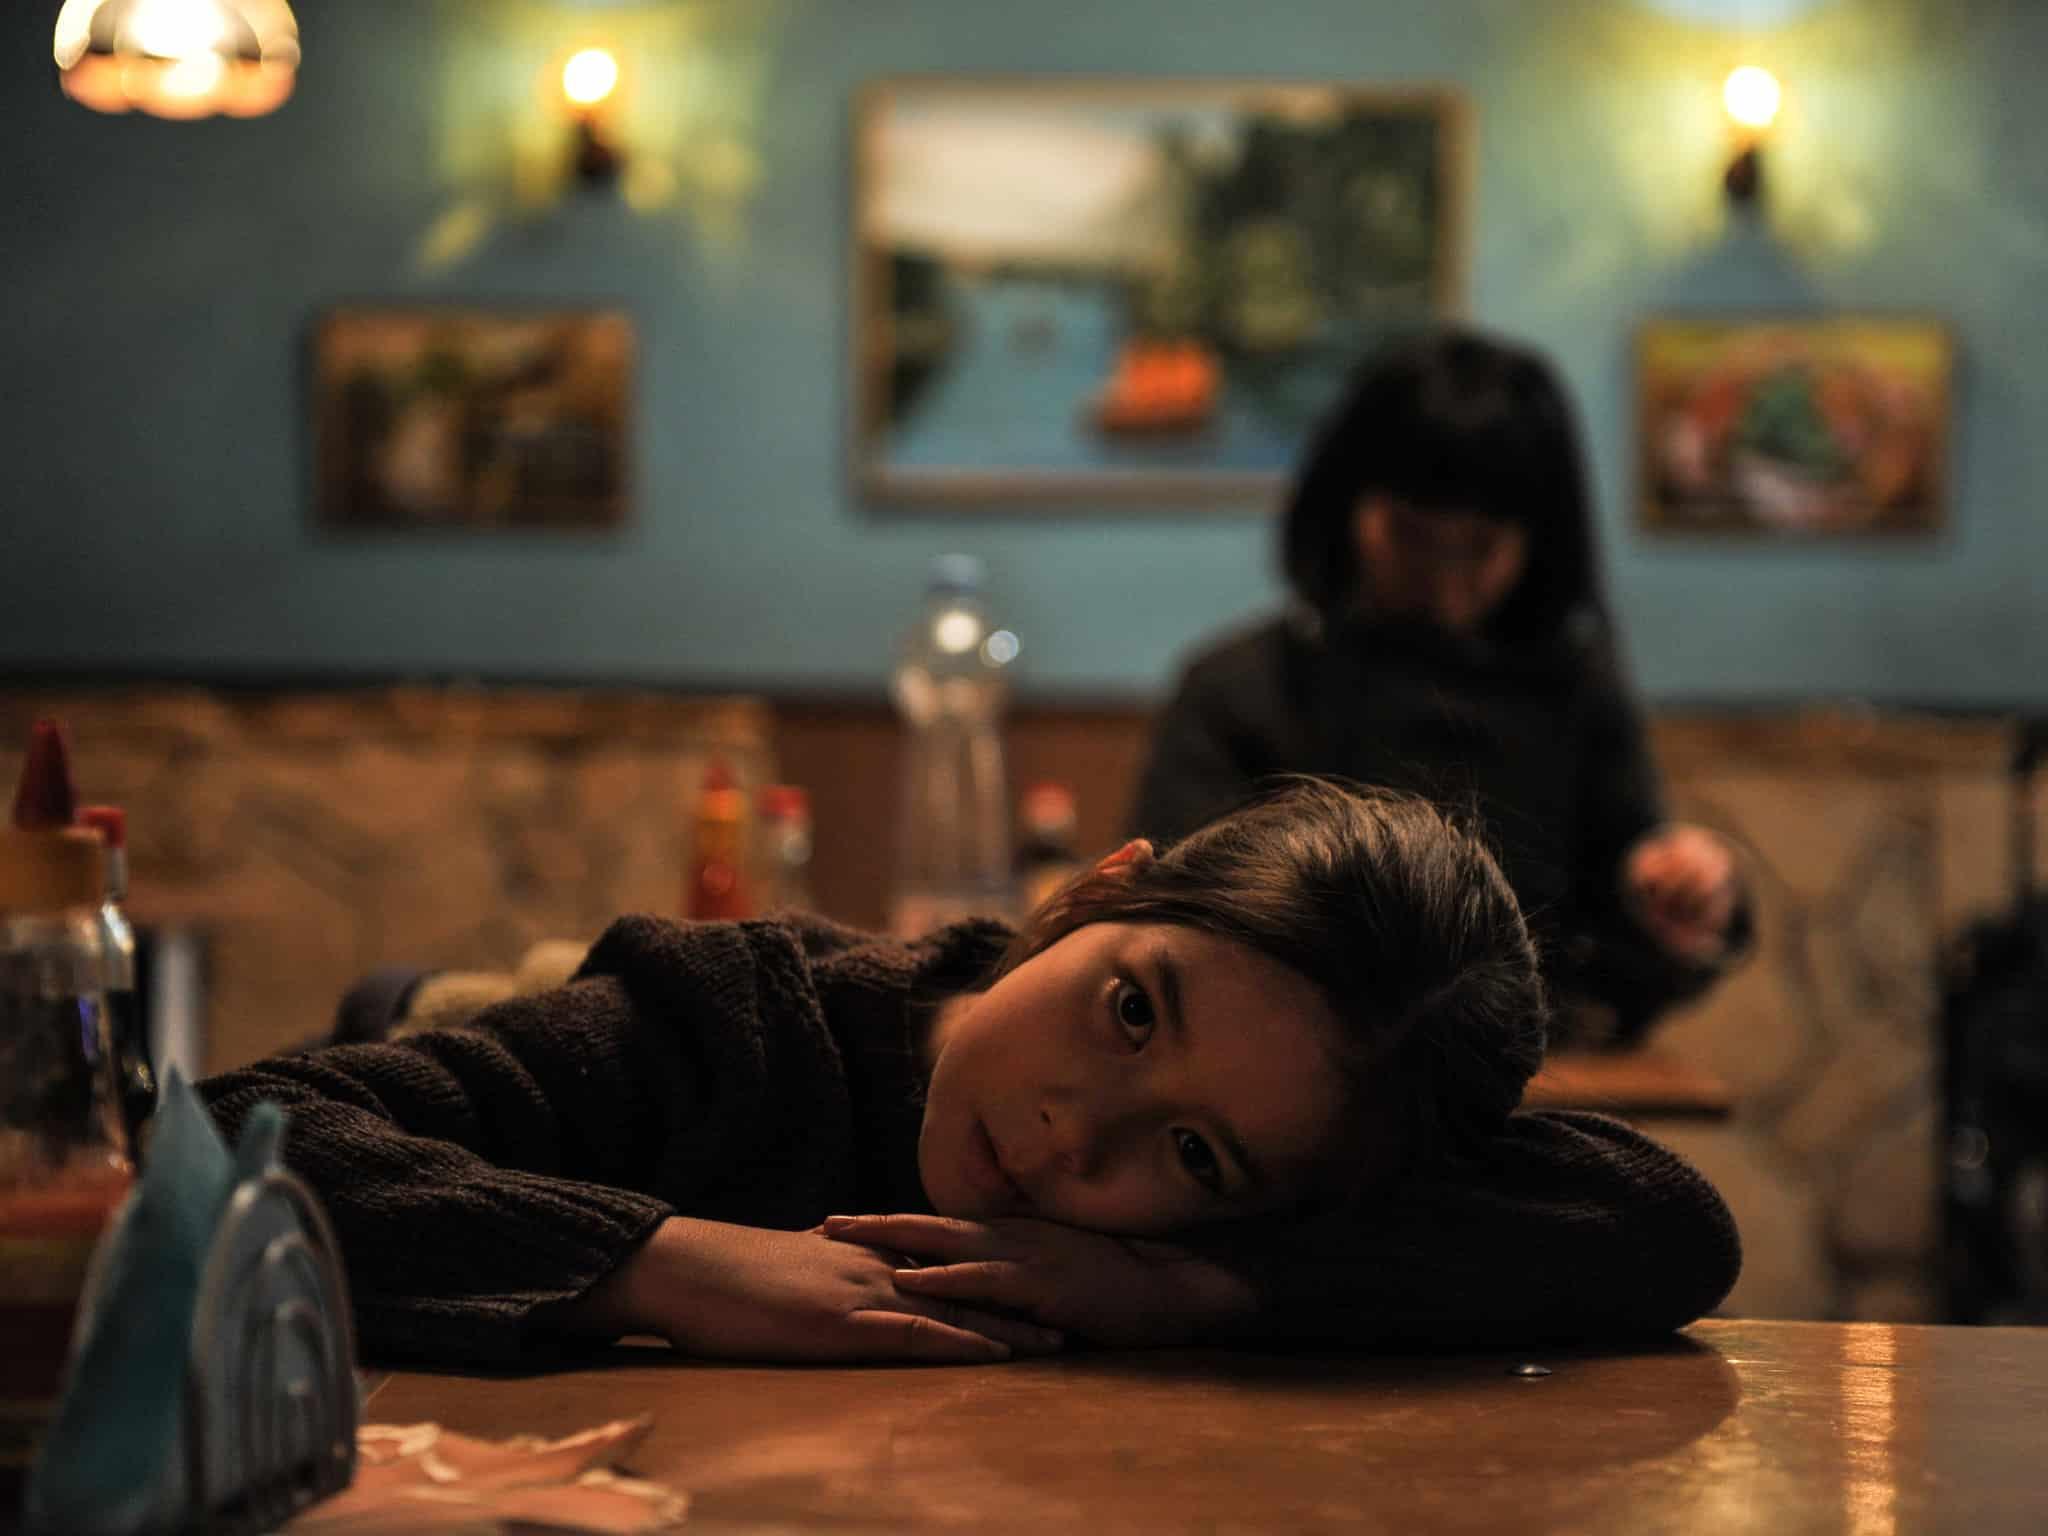 The Taste of Pho (Smak Pho), dir. Mariko Bobrik